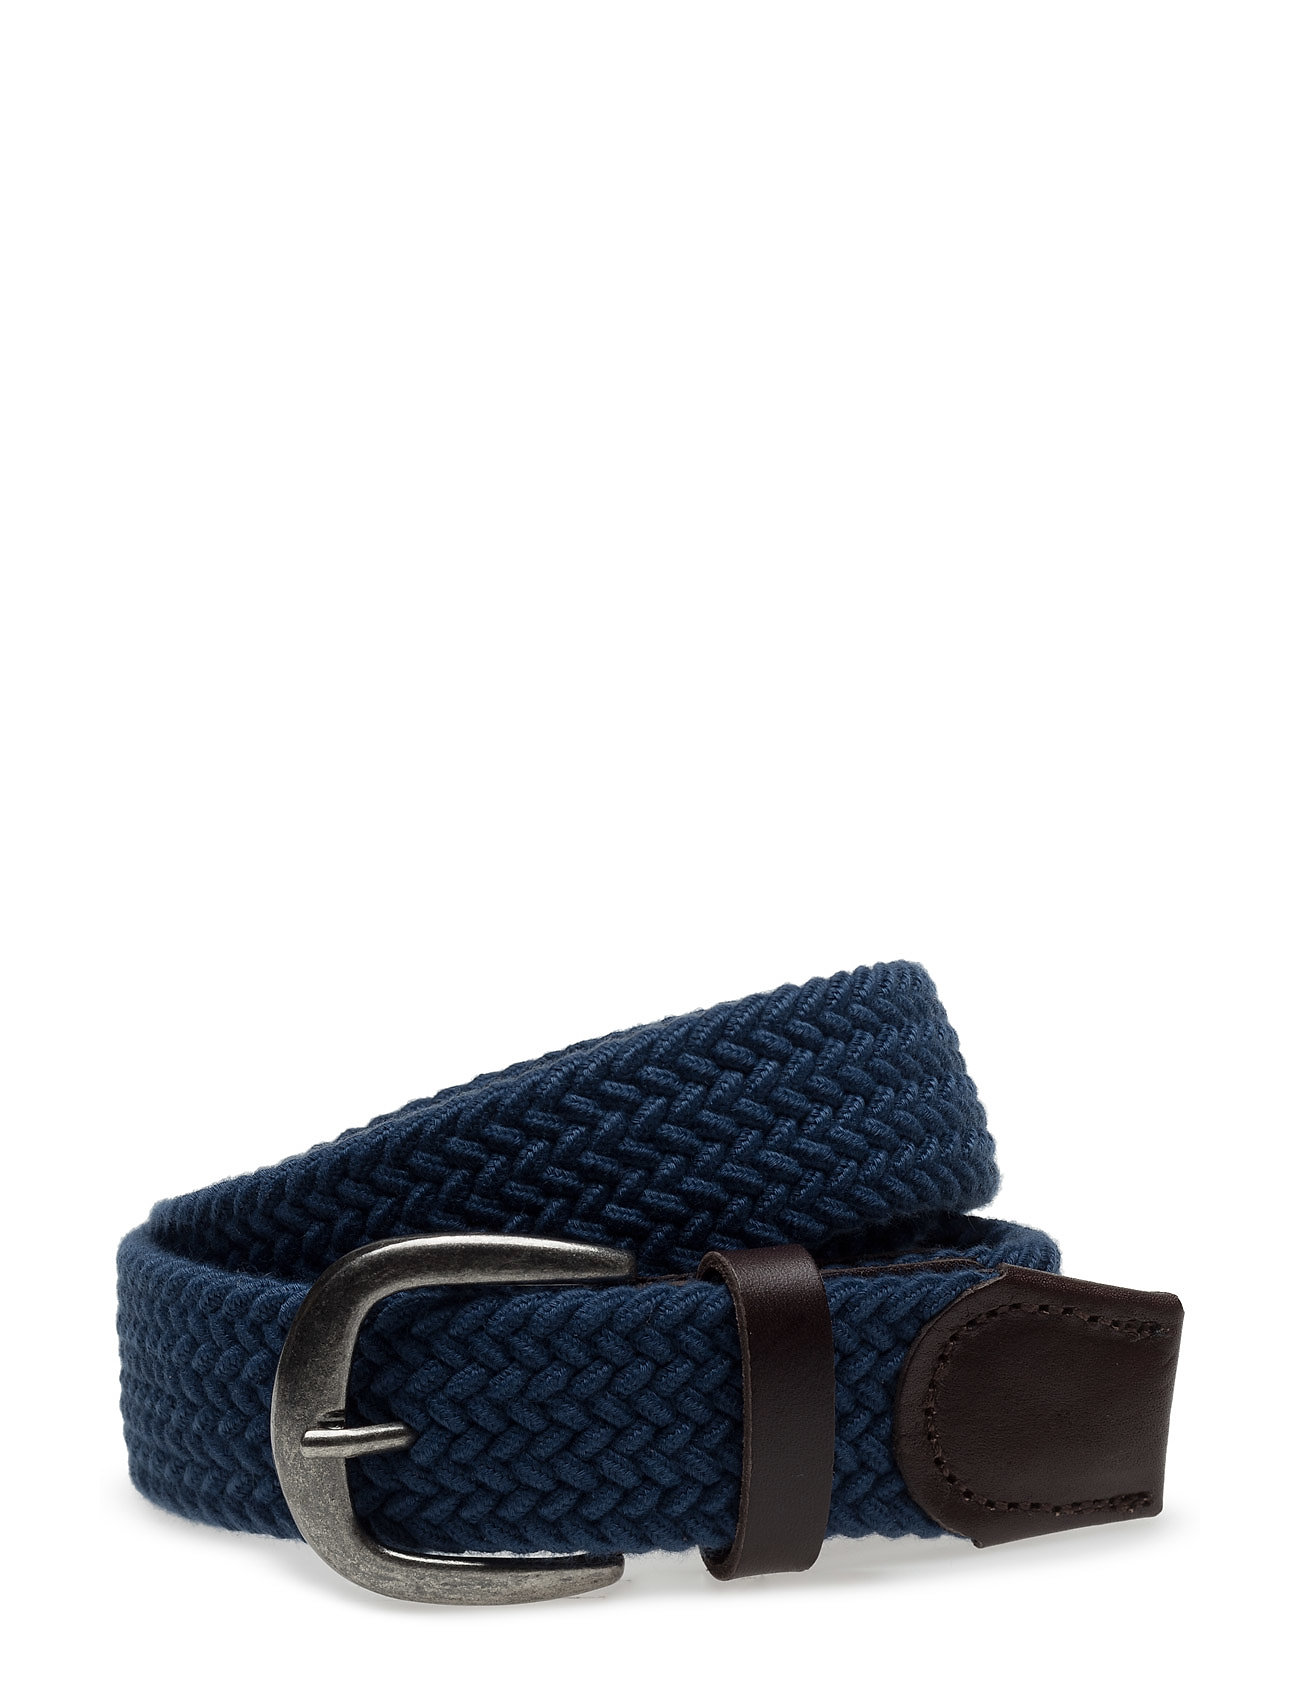 Leather-Appliqu Braided Belt Mango Man Bælter til Herrer i Medium Blå